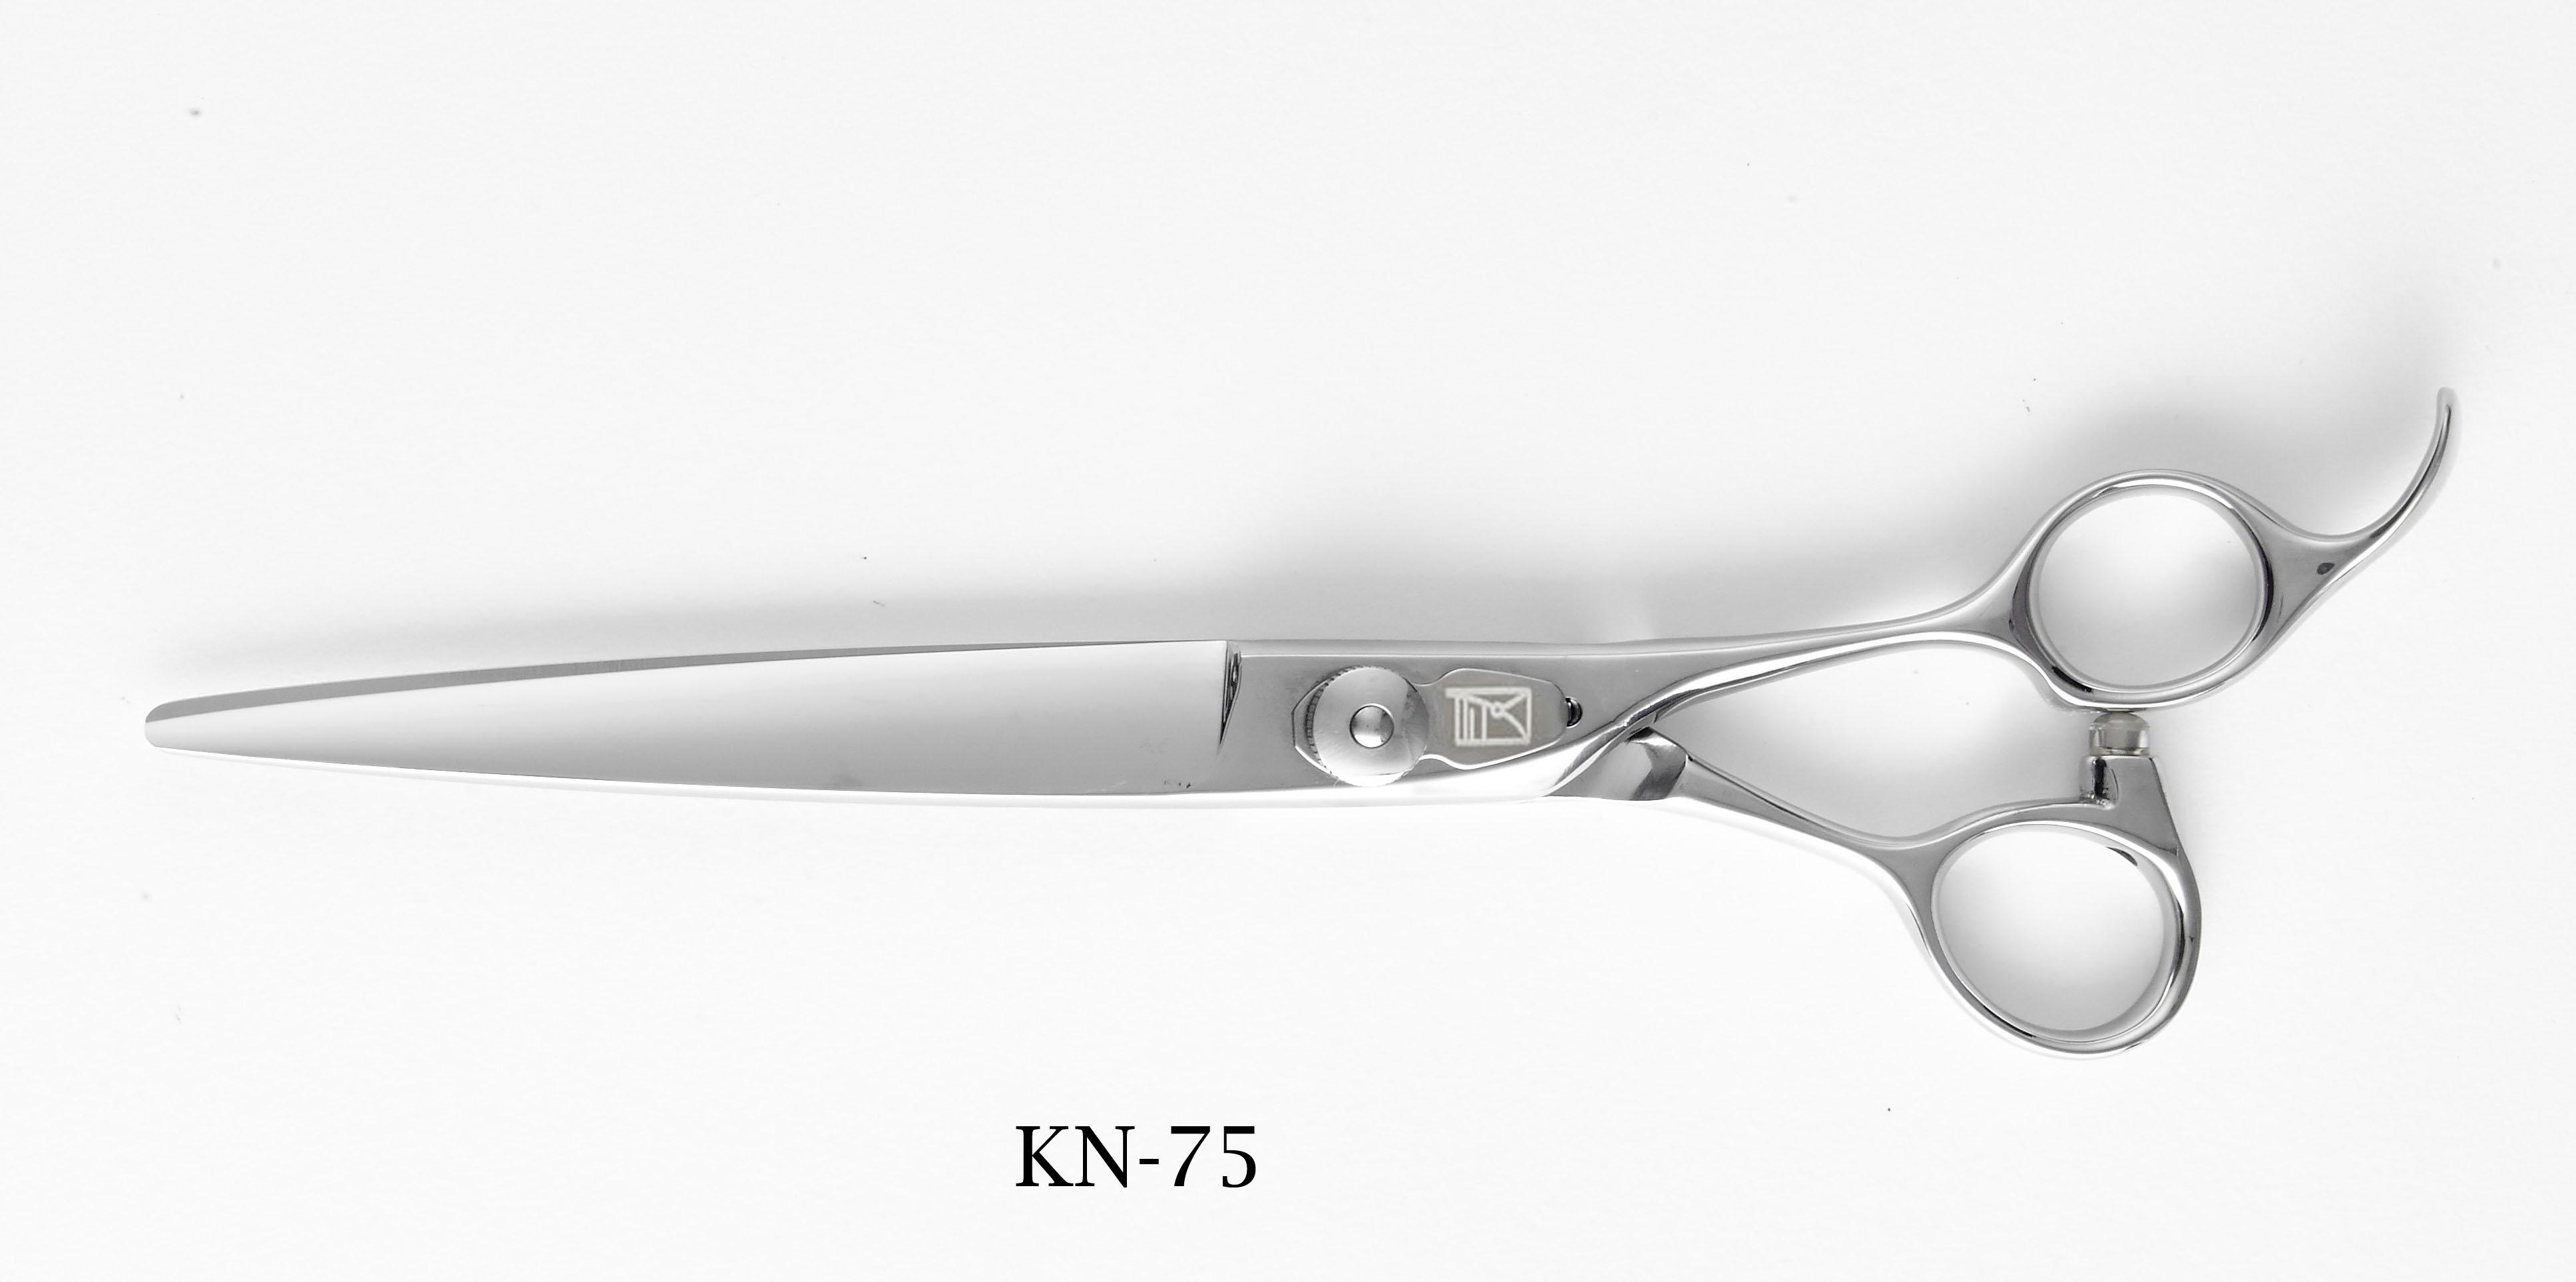 KN-75